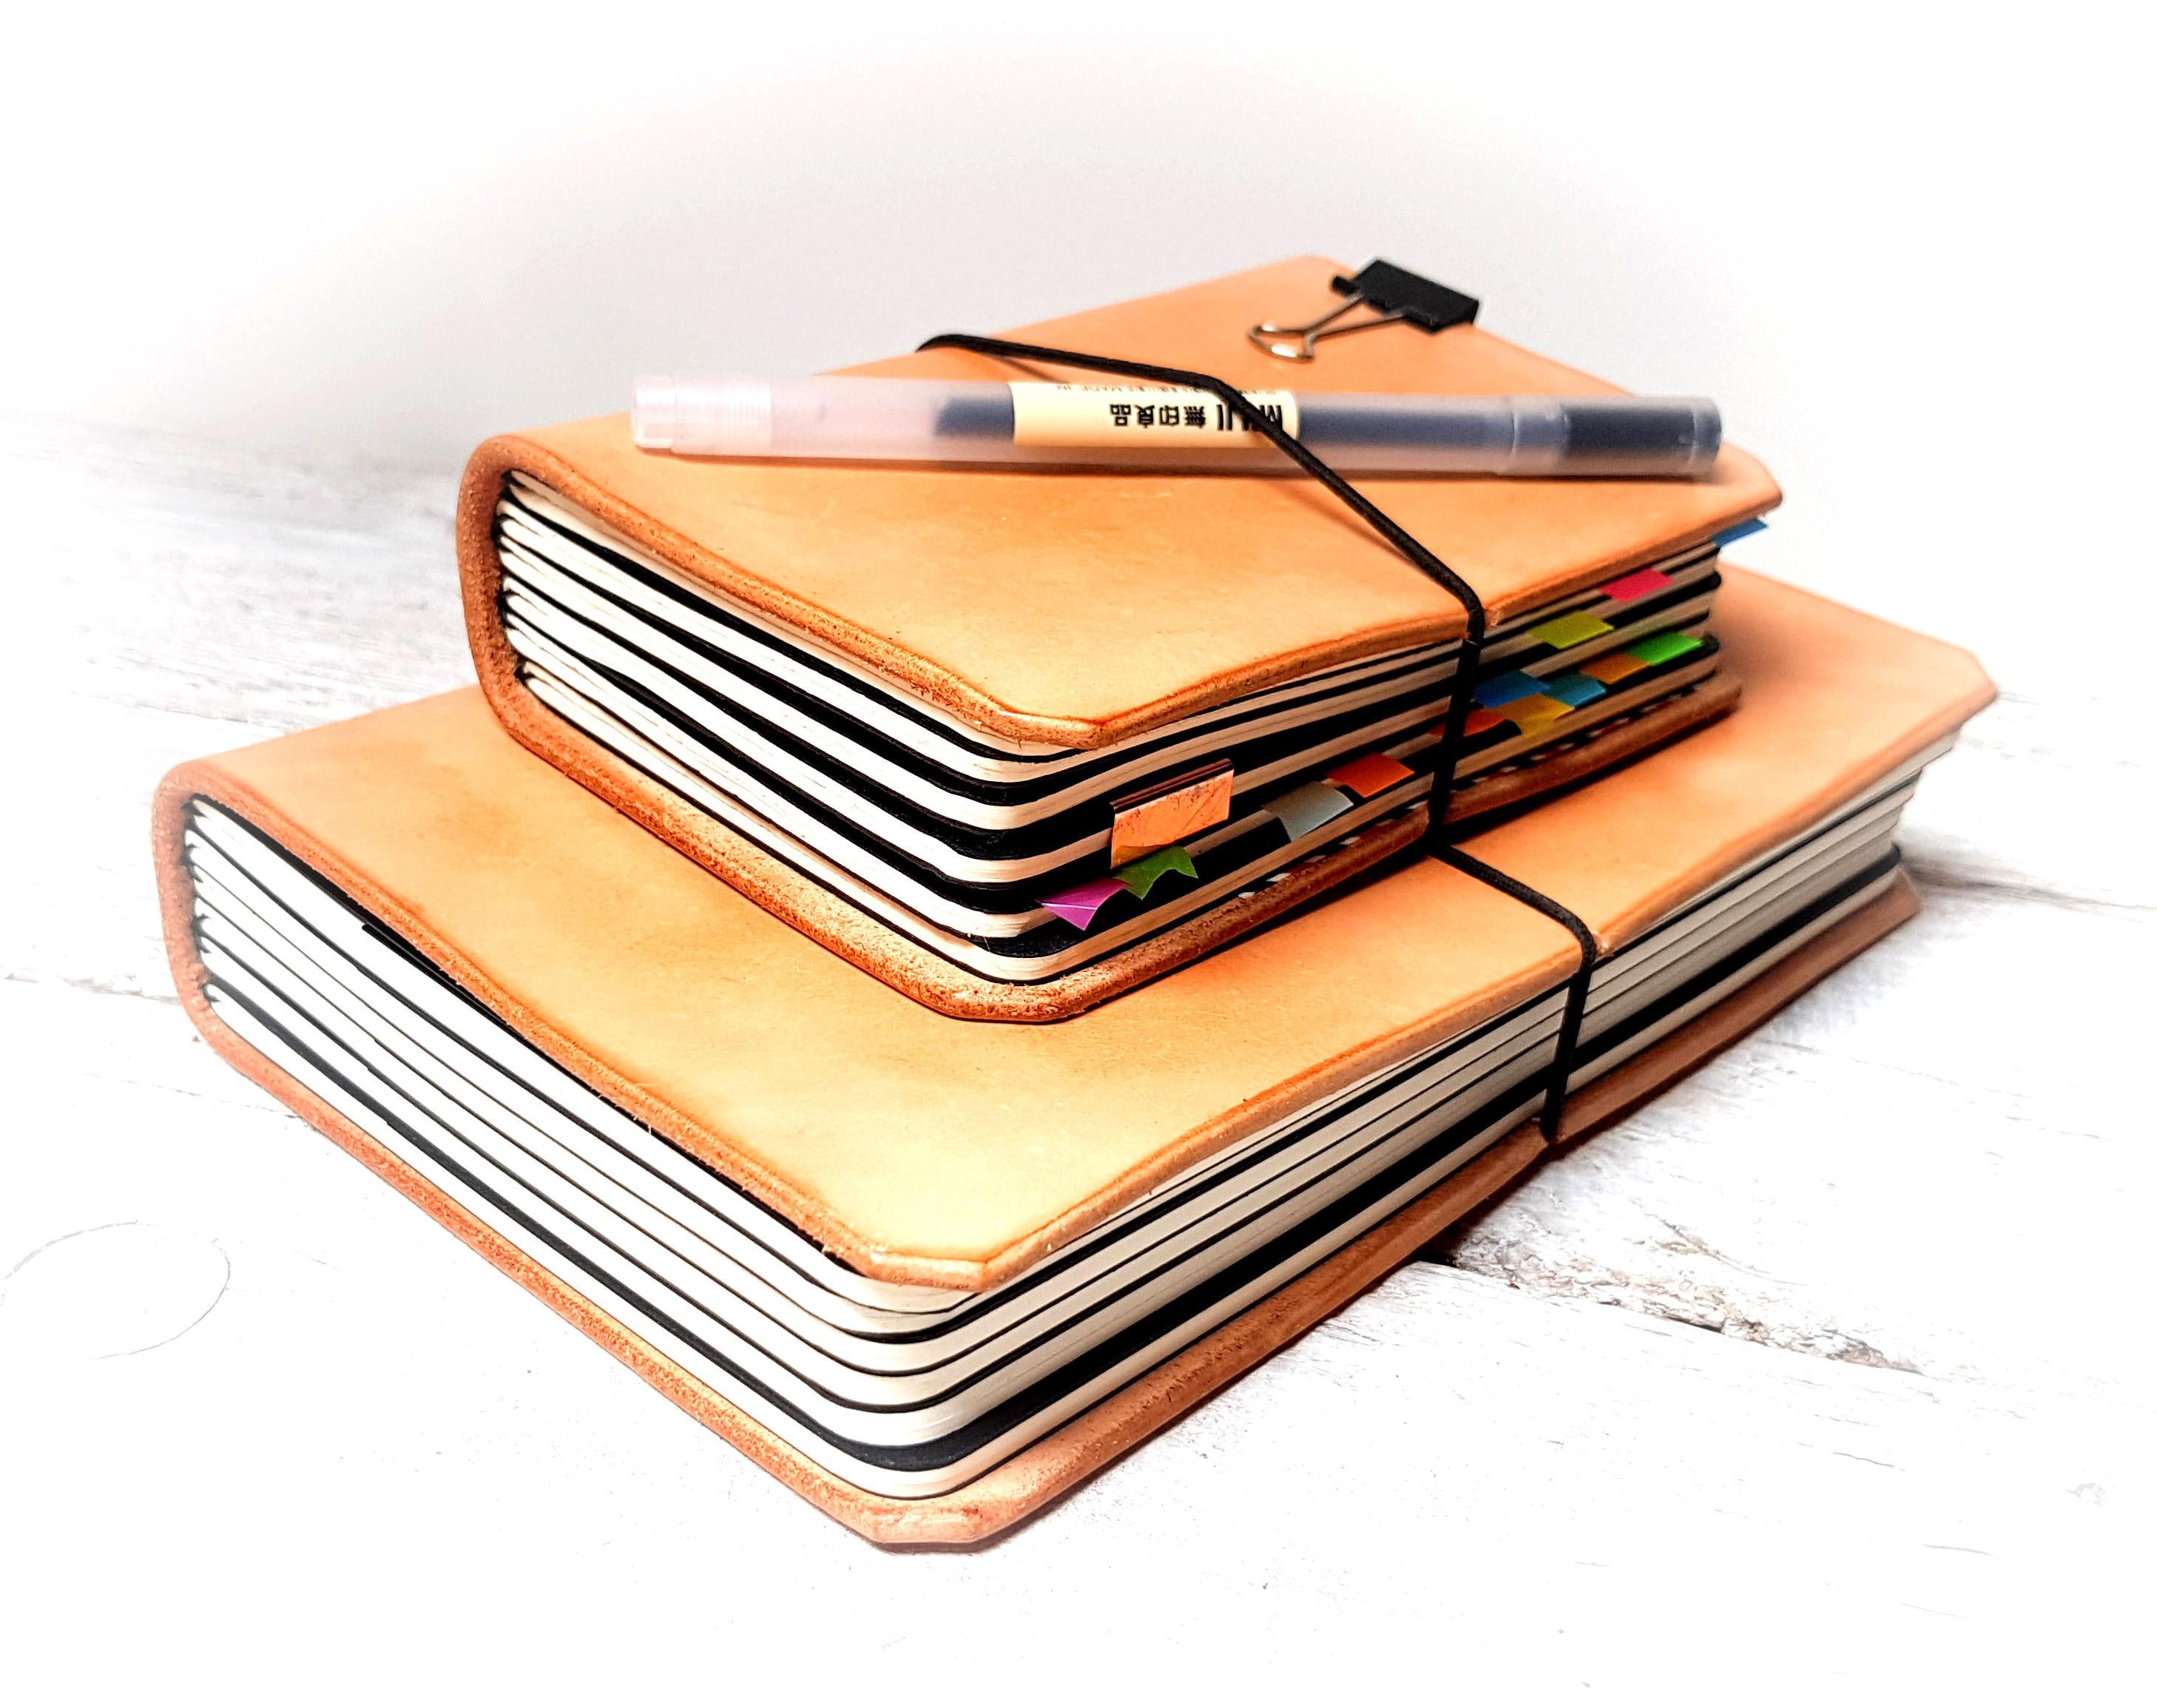 Midori Notebook Covers Fauxdori Cover Field Notes Cover